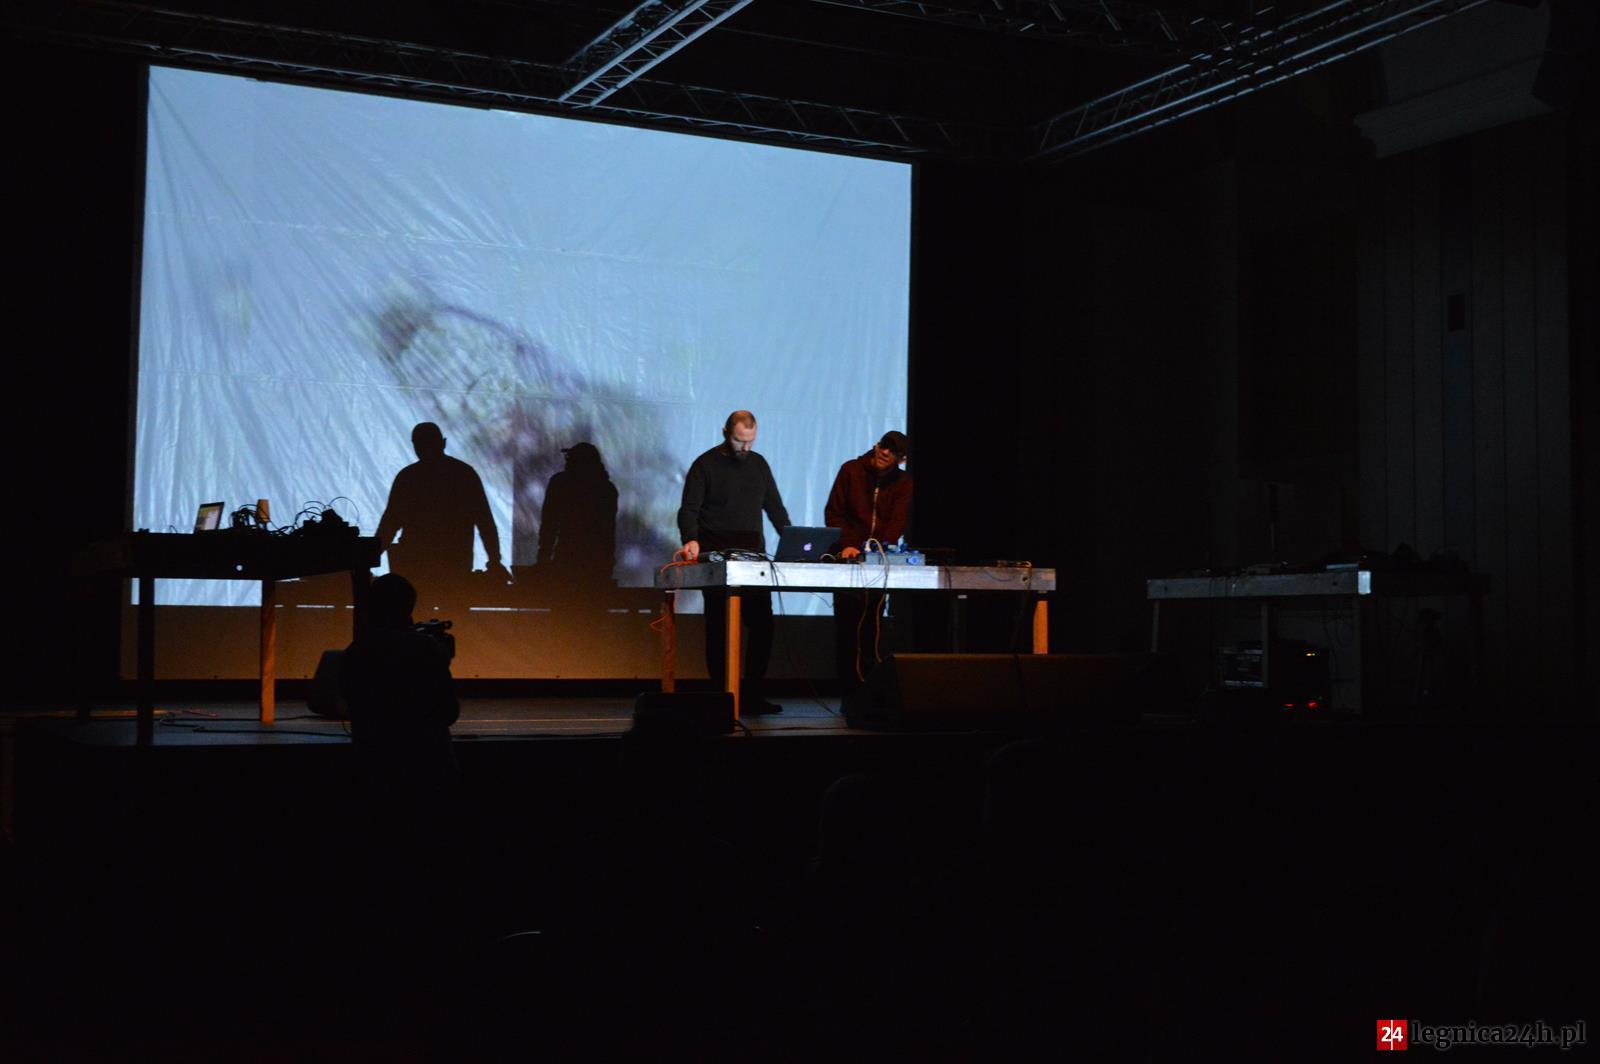 "(FOTO) Festiwal Form Audiowizualnych ""Intermediale"